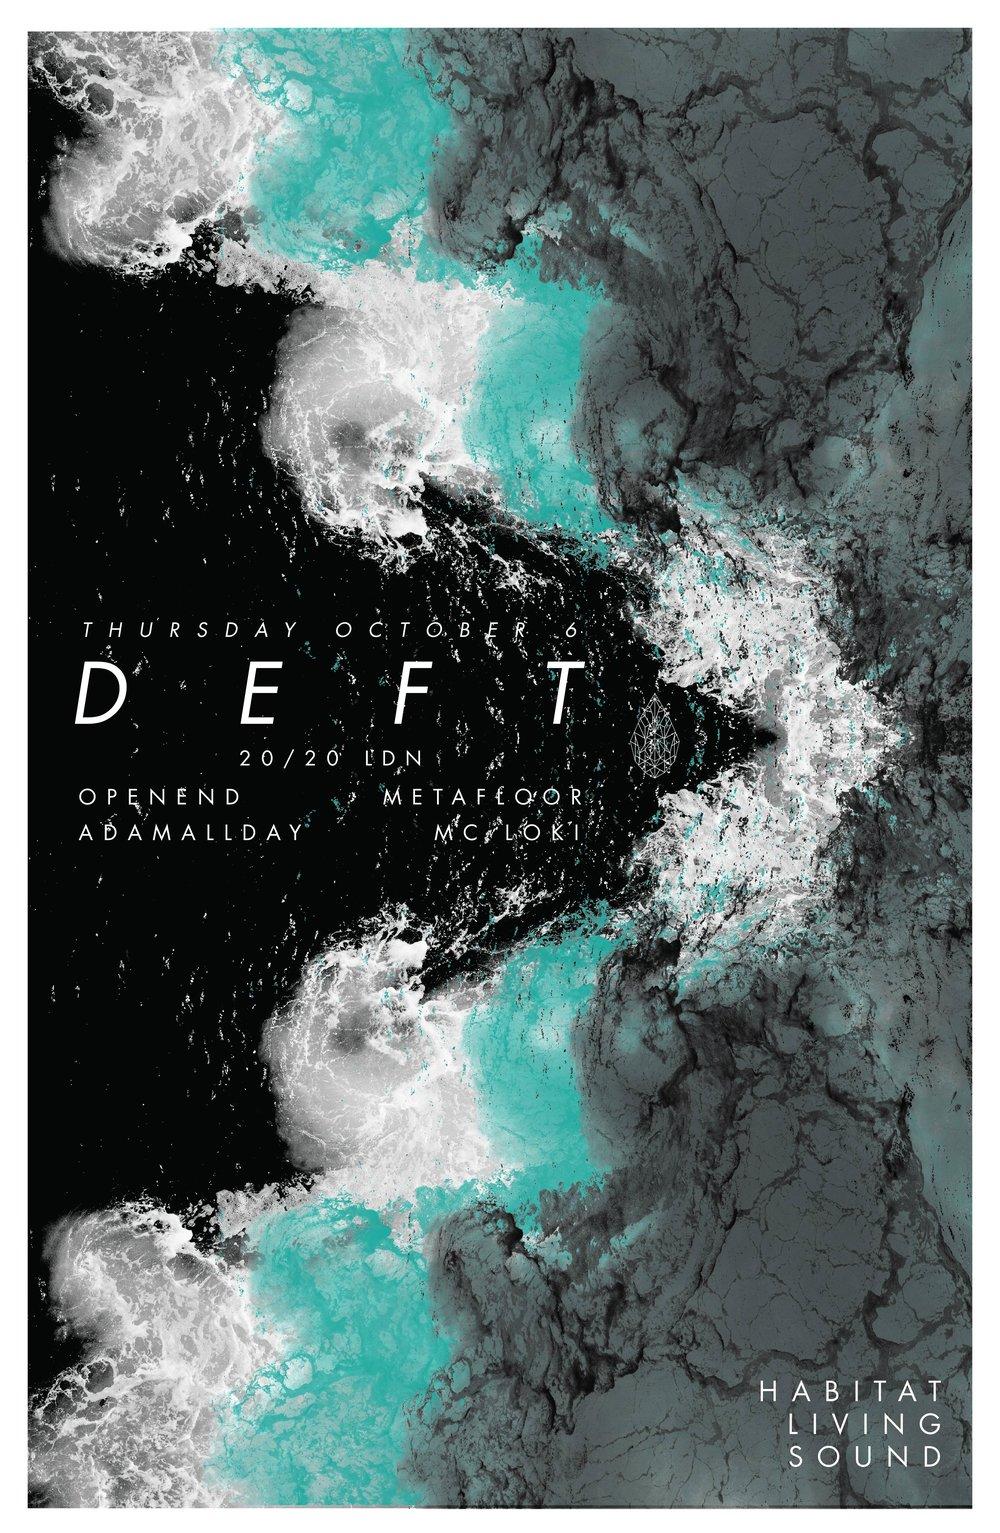 deft-habitat-living-sound.jpeg